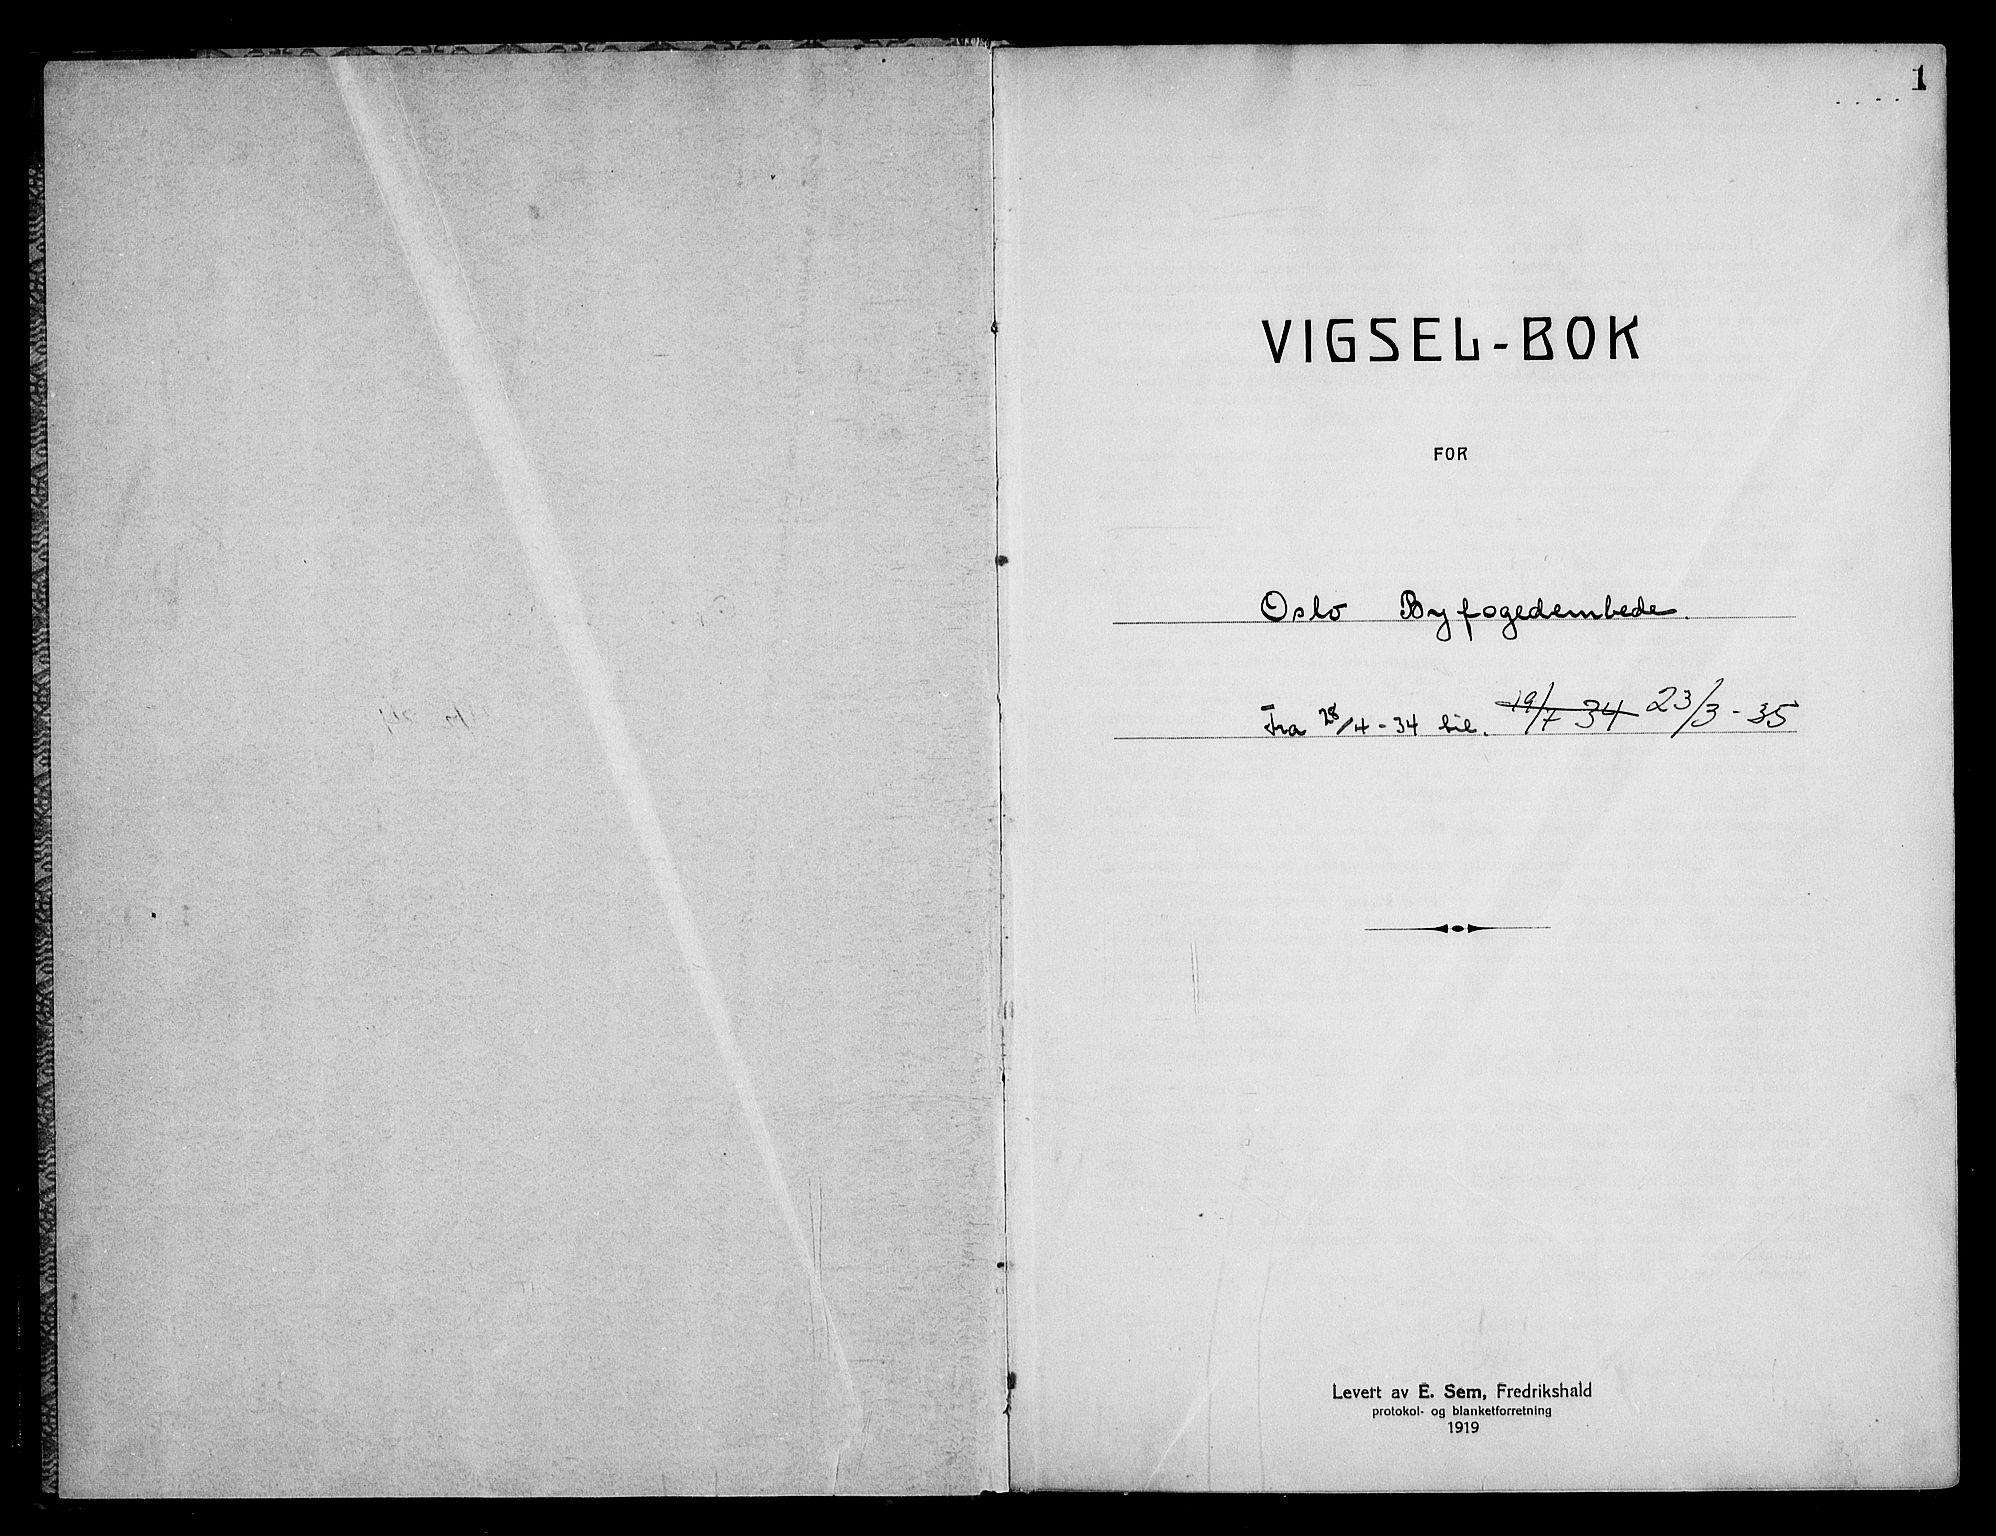 SAO, Oslo byfogd avd. I, L/Lb/Lbb/L0024: Notarialprotokoll, rekke II: Vigsler, 1934-1935, s. 1a